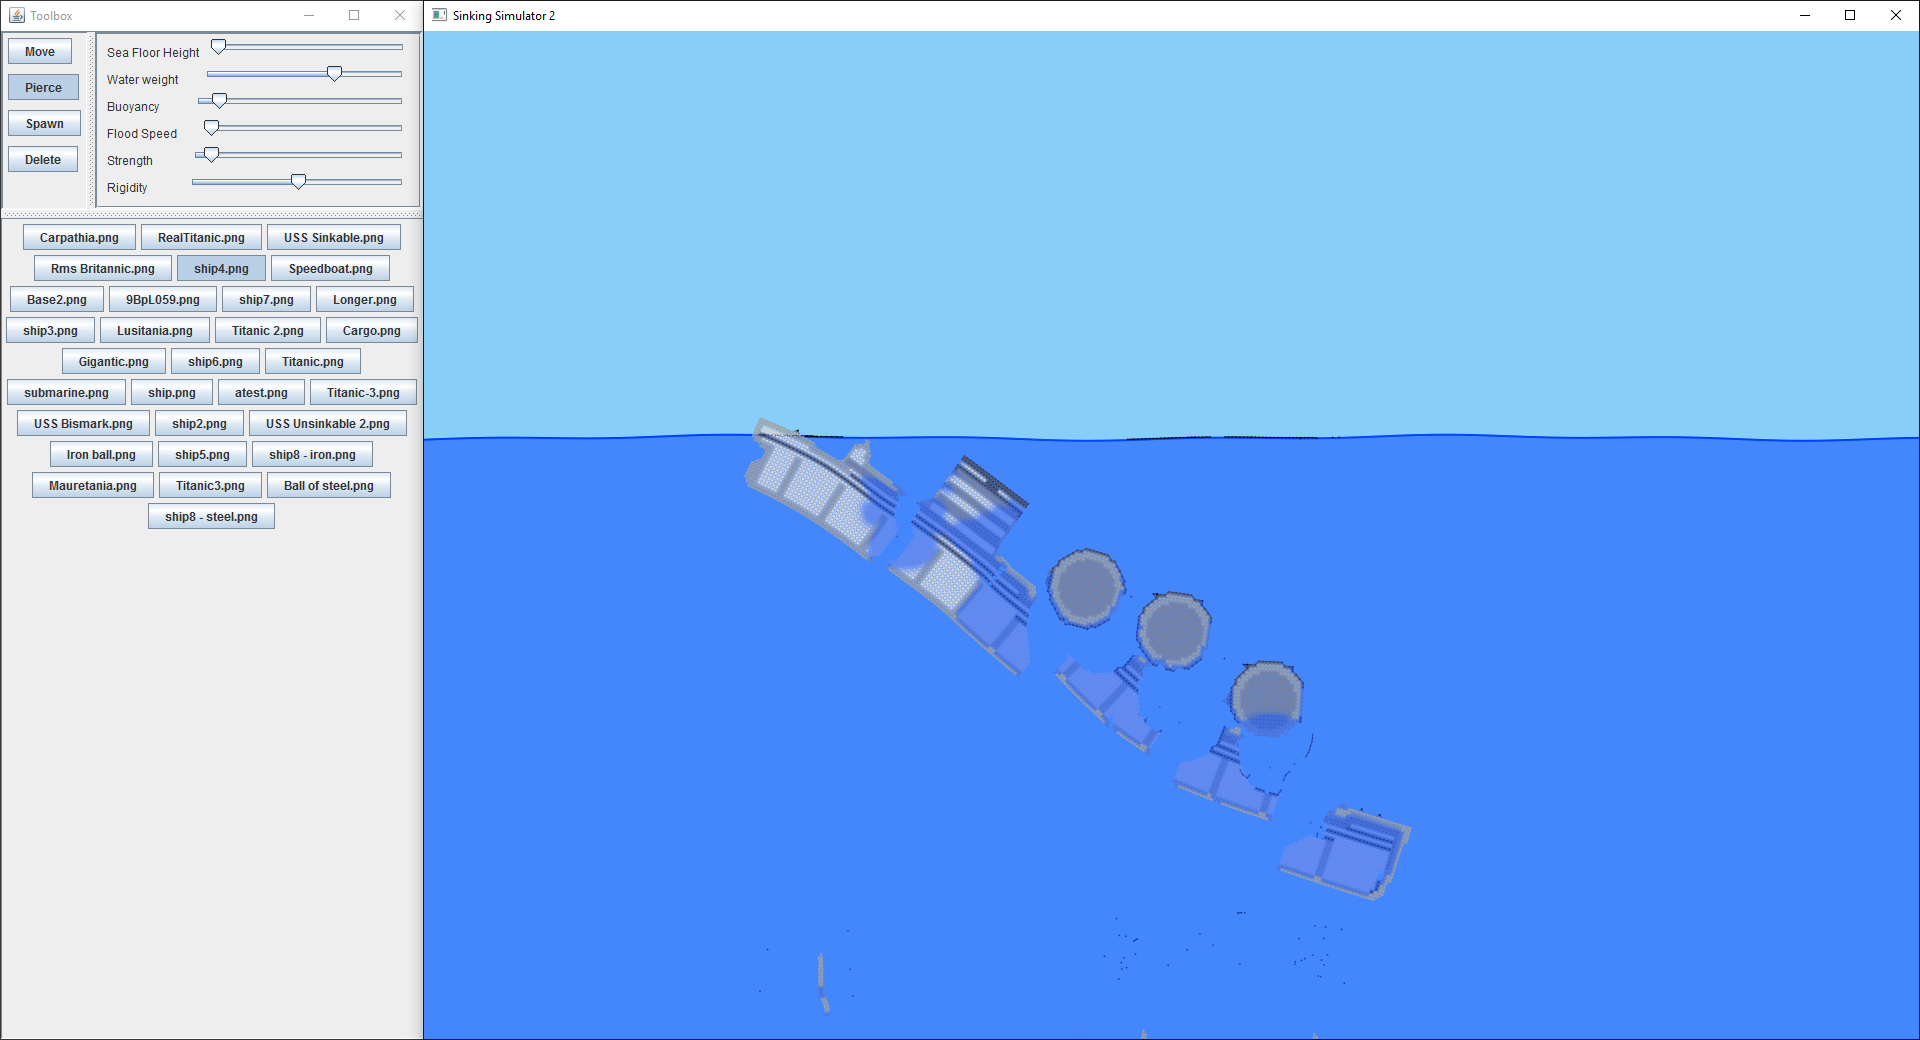 Sinking Simulator 2 alpha 0.0.1 file.